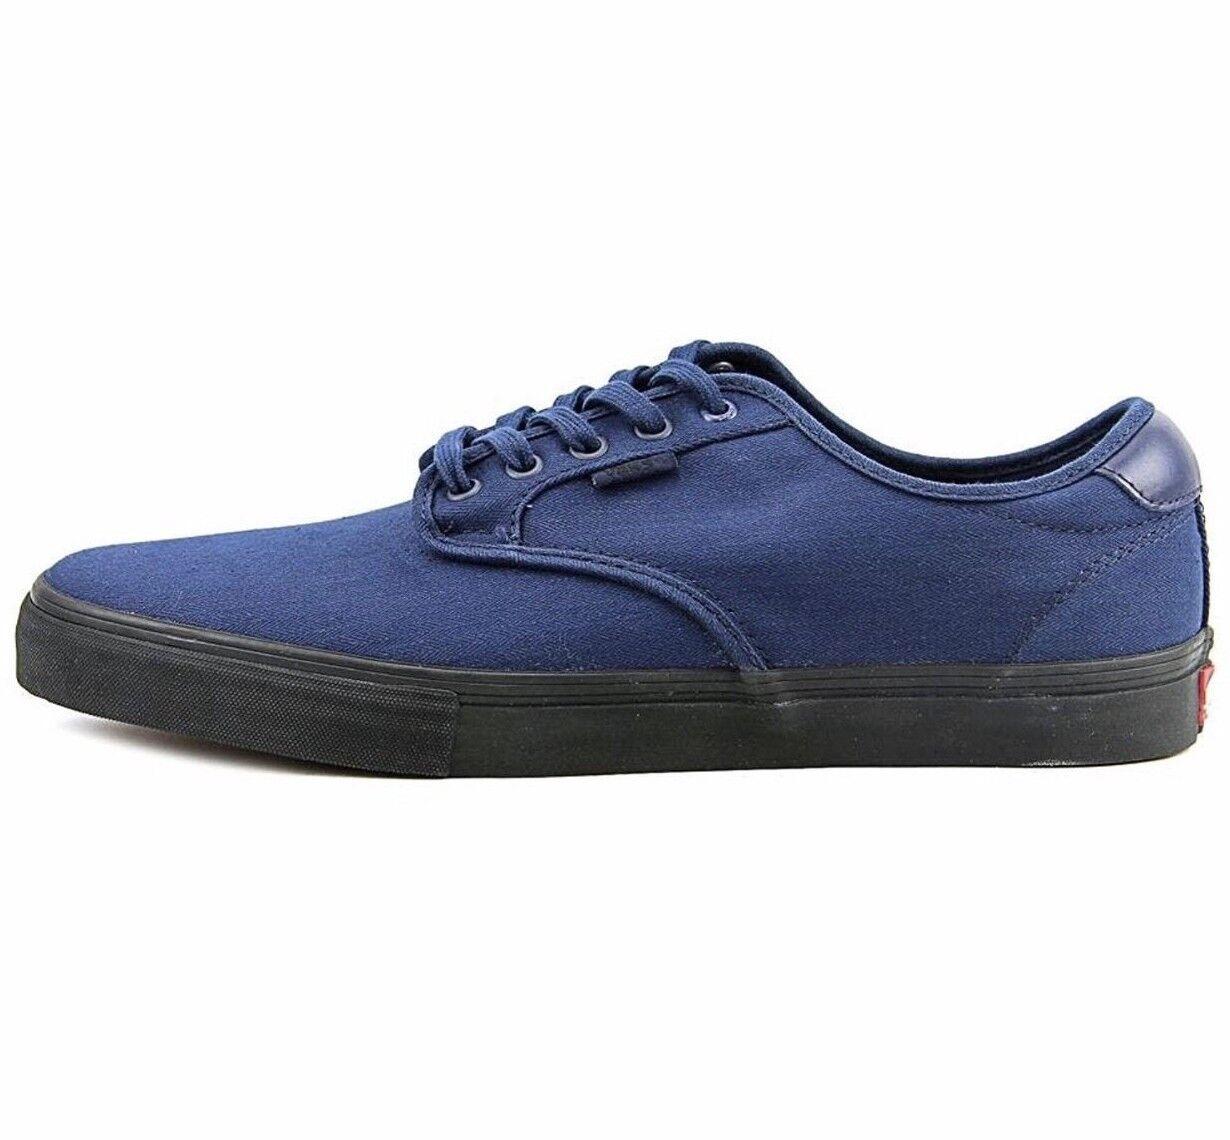 VANS VANS VANS Chima Ferguson Pro (Mono) Vestido Azuls Ultracush Para Hombre De Skate Talla 13 947def